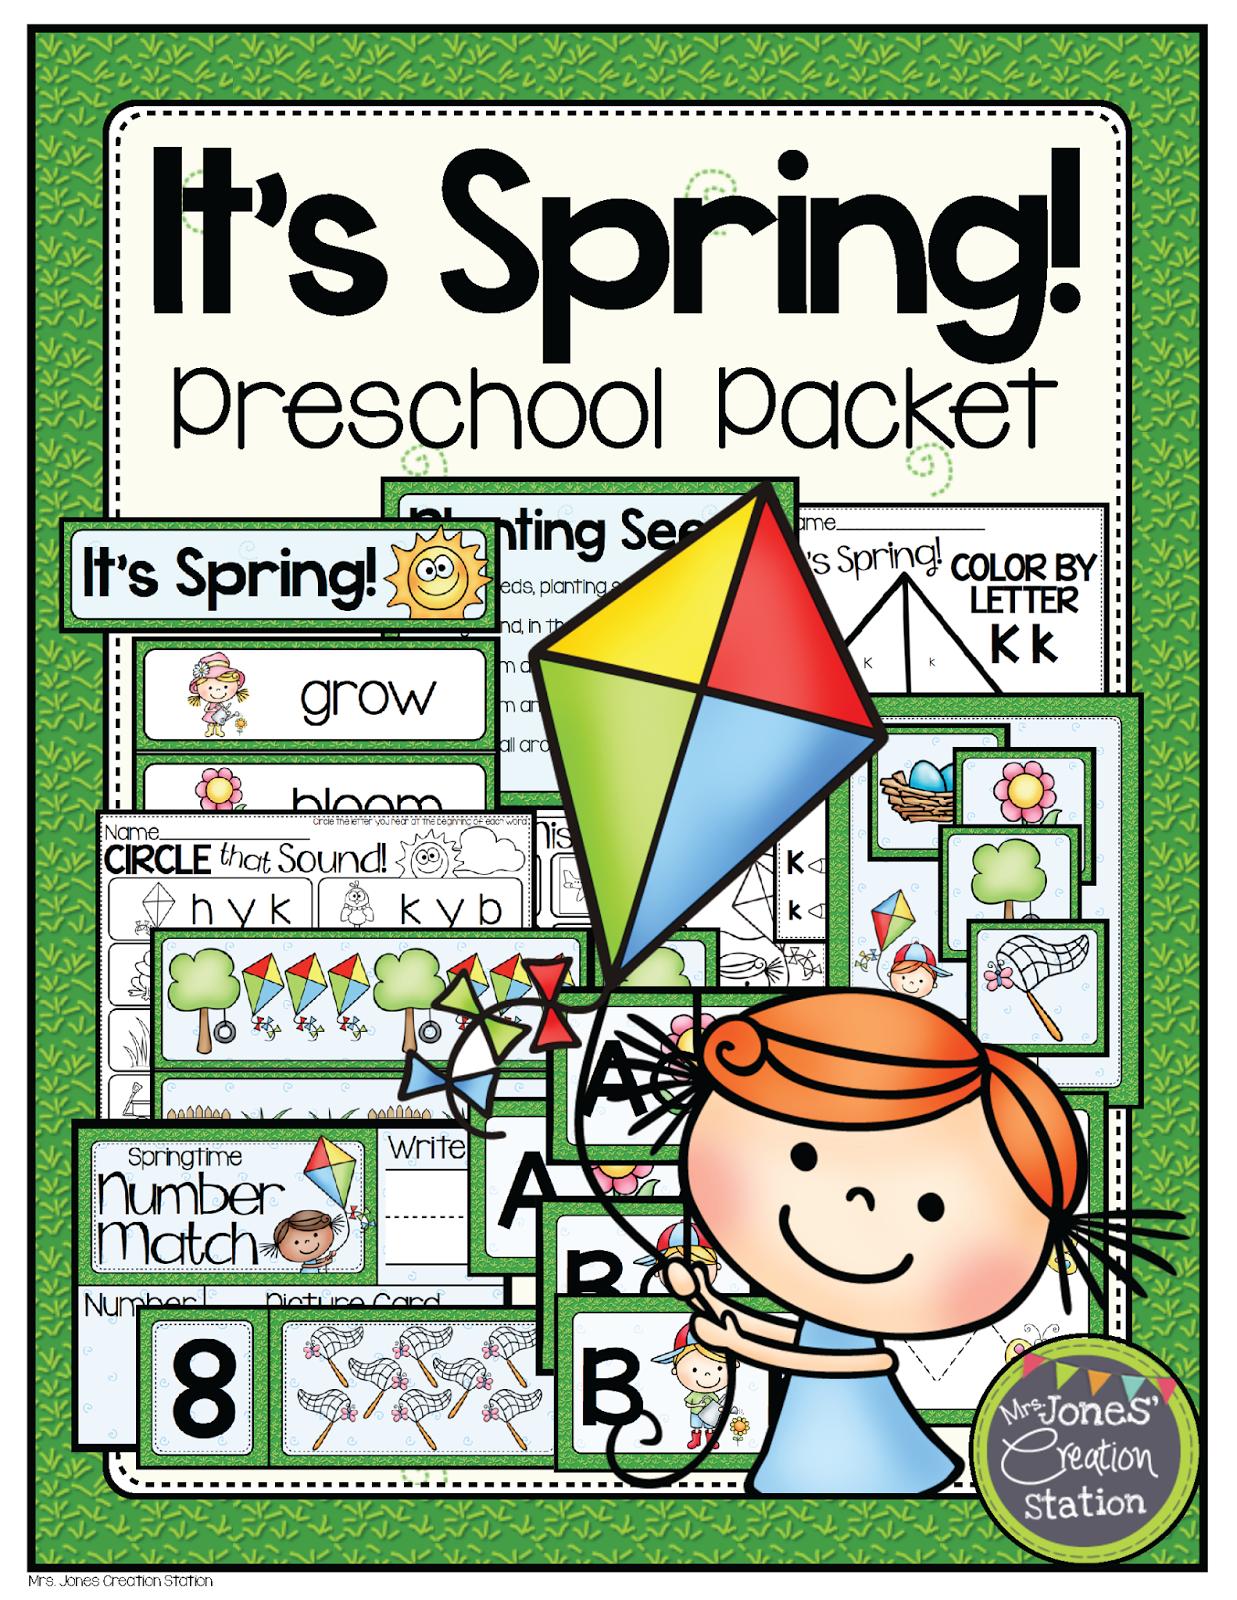 Mrs Jones Creation Station Spring Preschool Pack